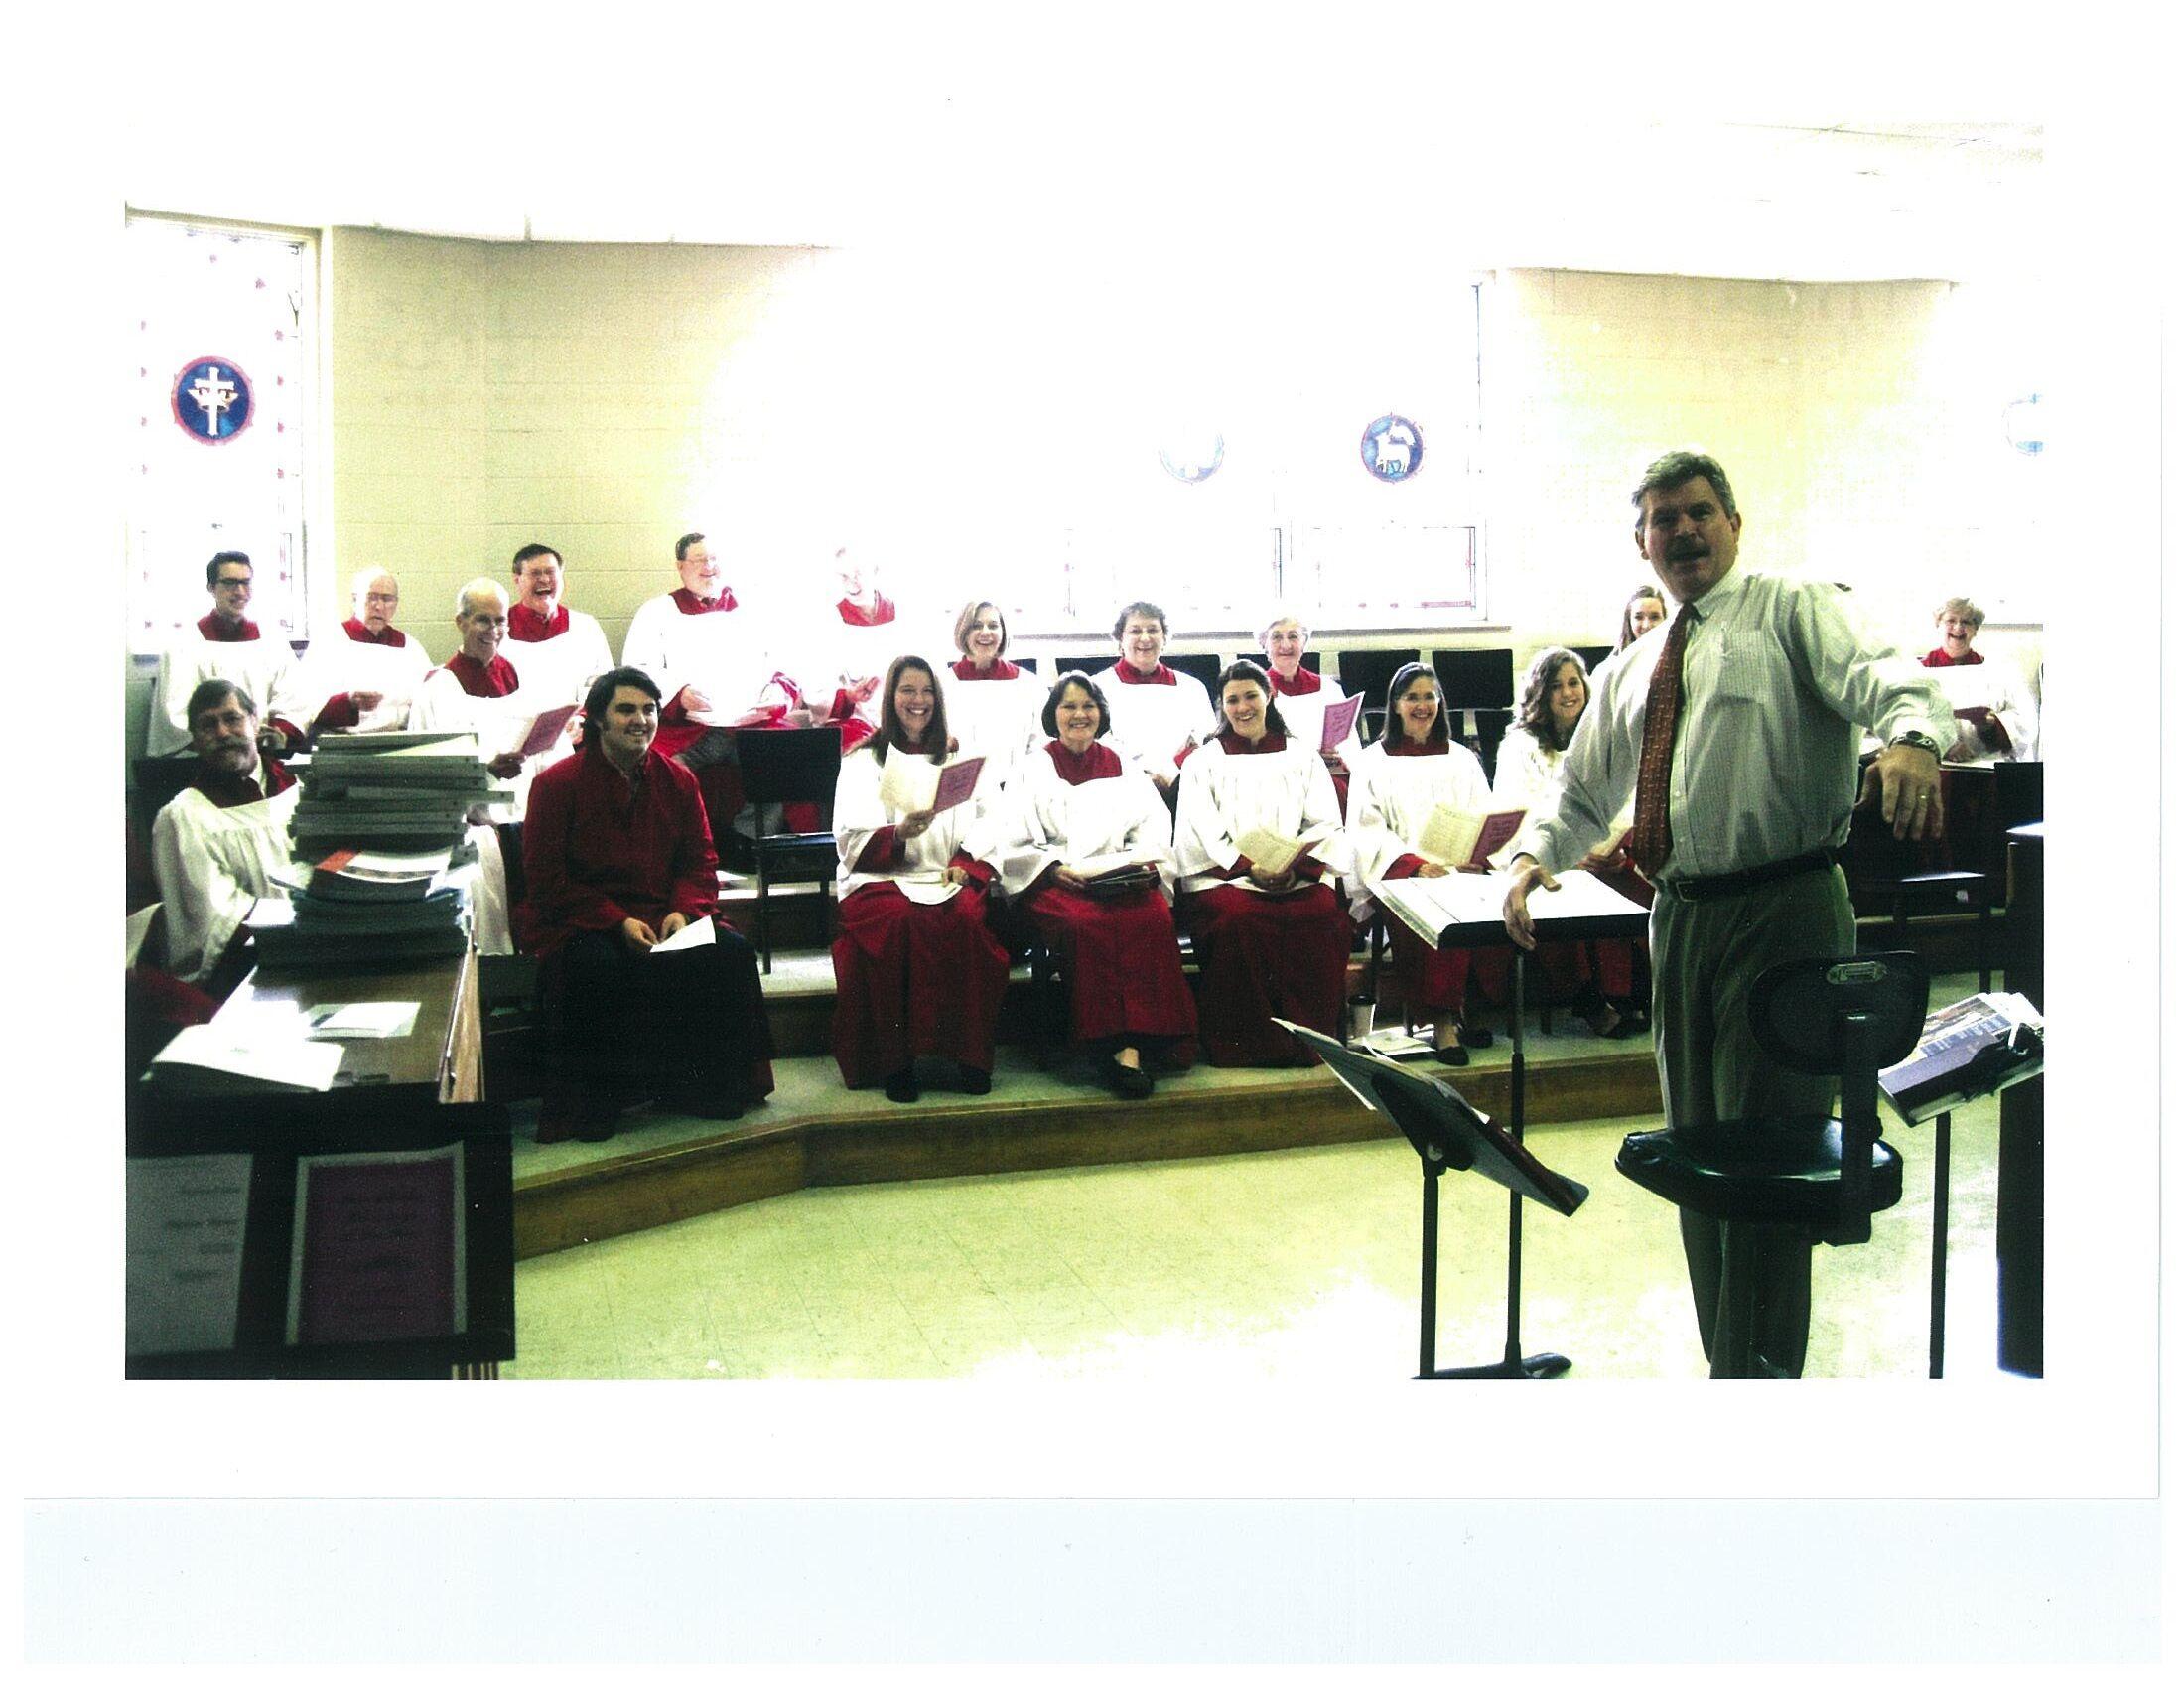 Second Presbyterian Church Choir, Roanoke, VA